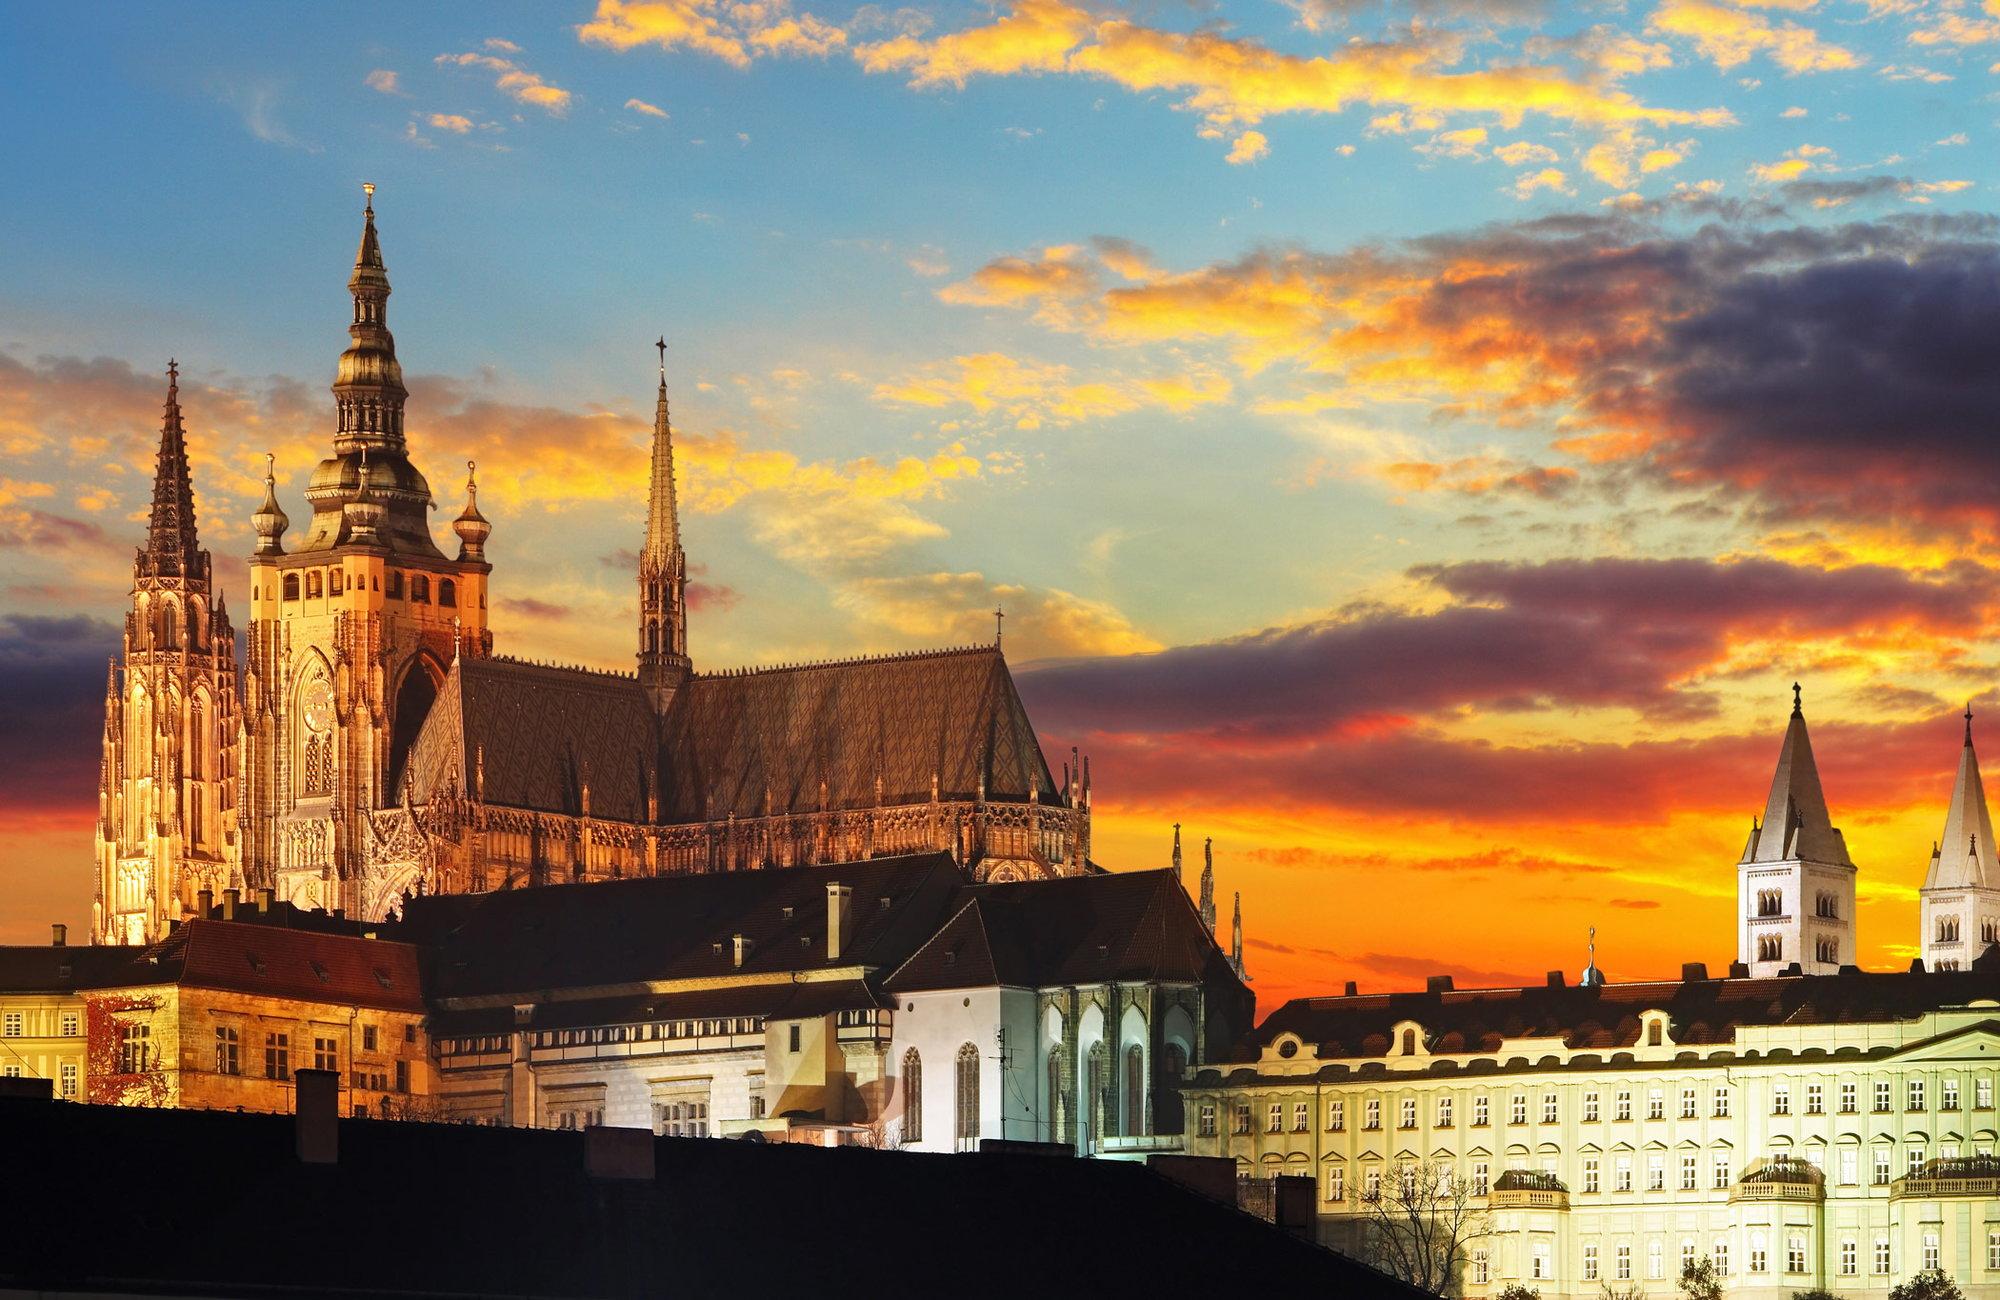 Vienna hotels fodor s - Vienna Hotels Fodor S 26